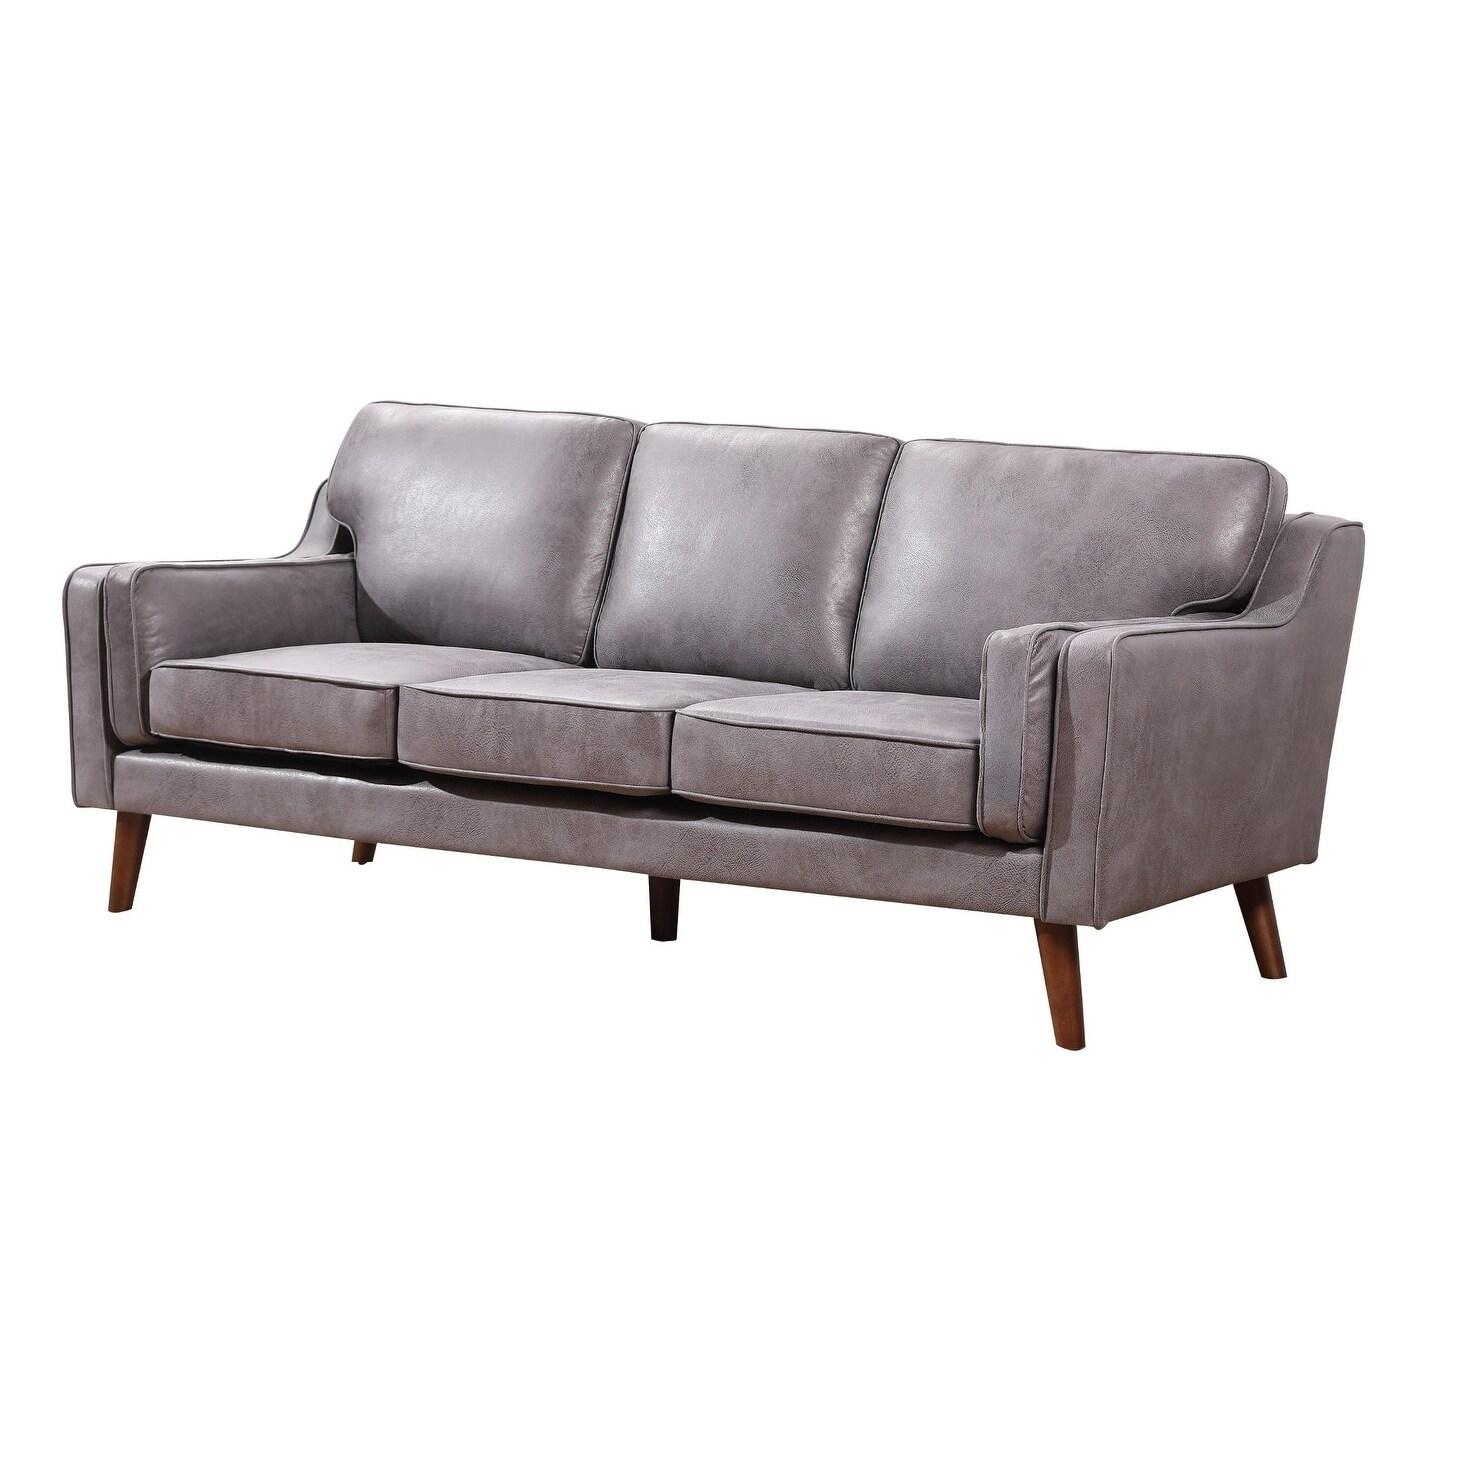 Shop Jenny Mid-Century Air Leather Fabric Sofa - Free ...